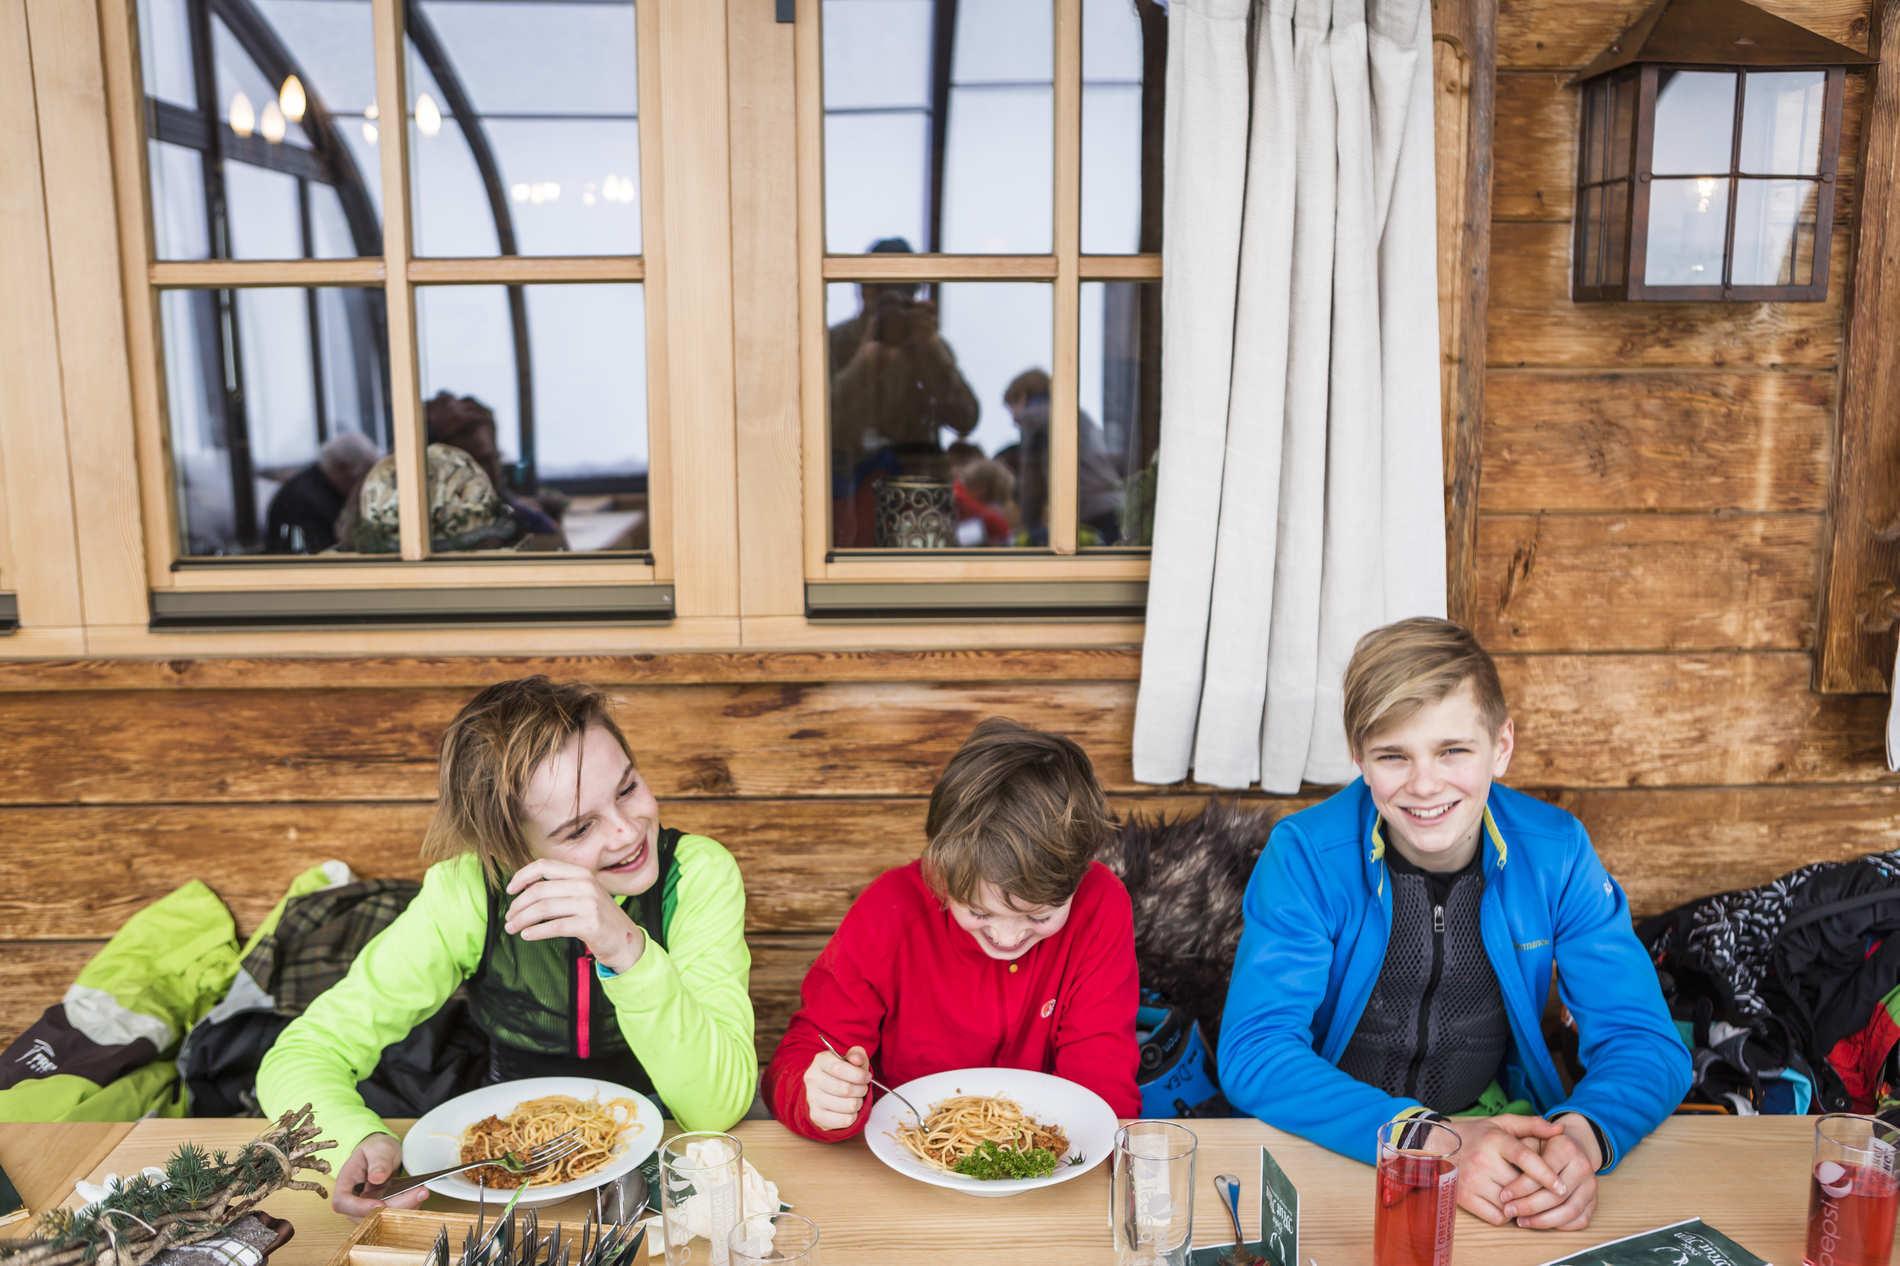 obergurgl 16 02 2018 lifestyle roland haschka qparks 022